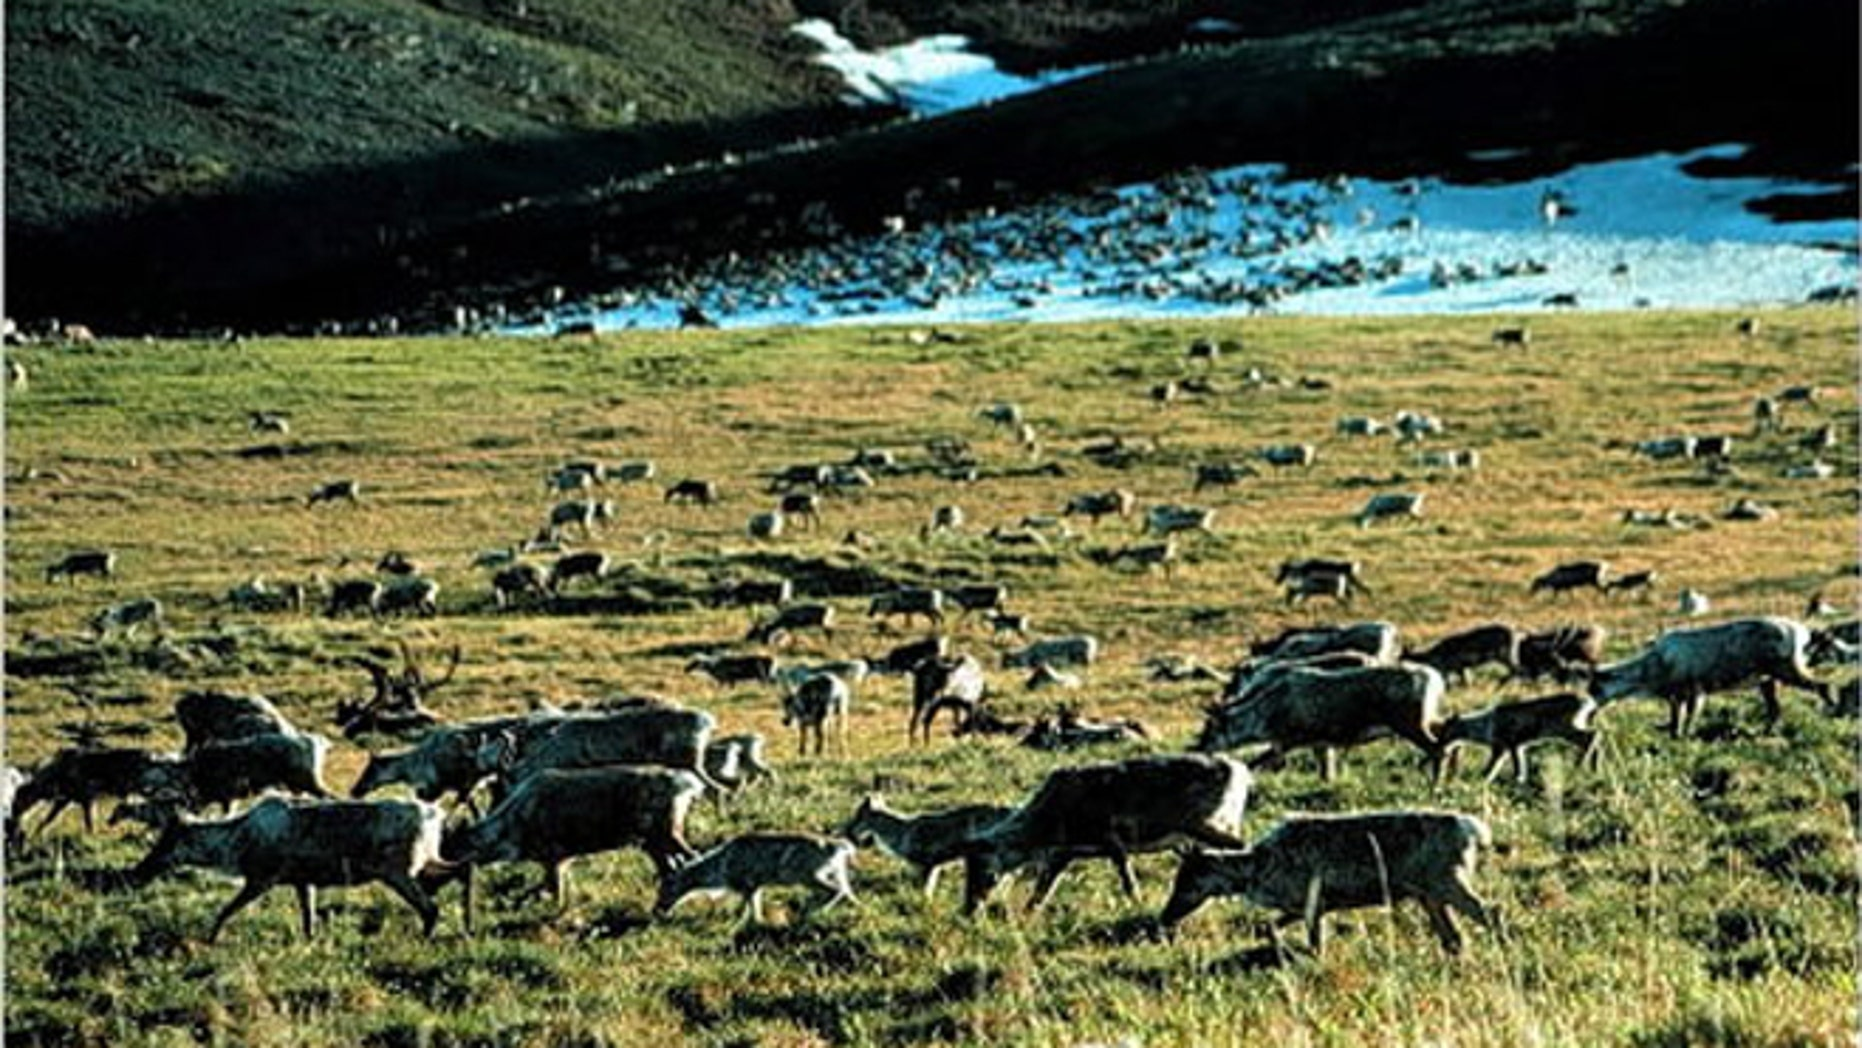 Caribou grazing in the Arctic National Wildlife Refuge in Alaska.